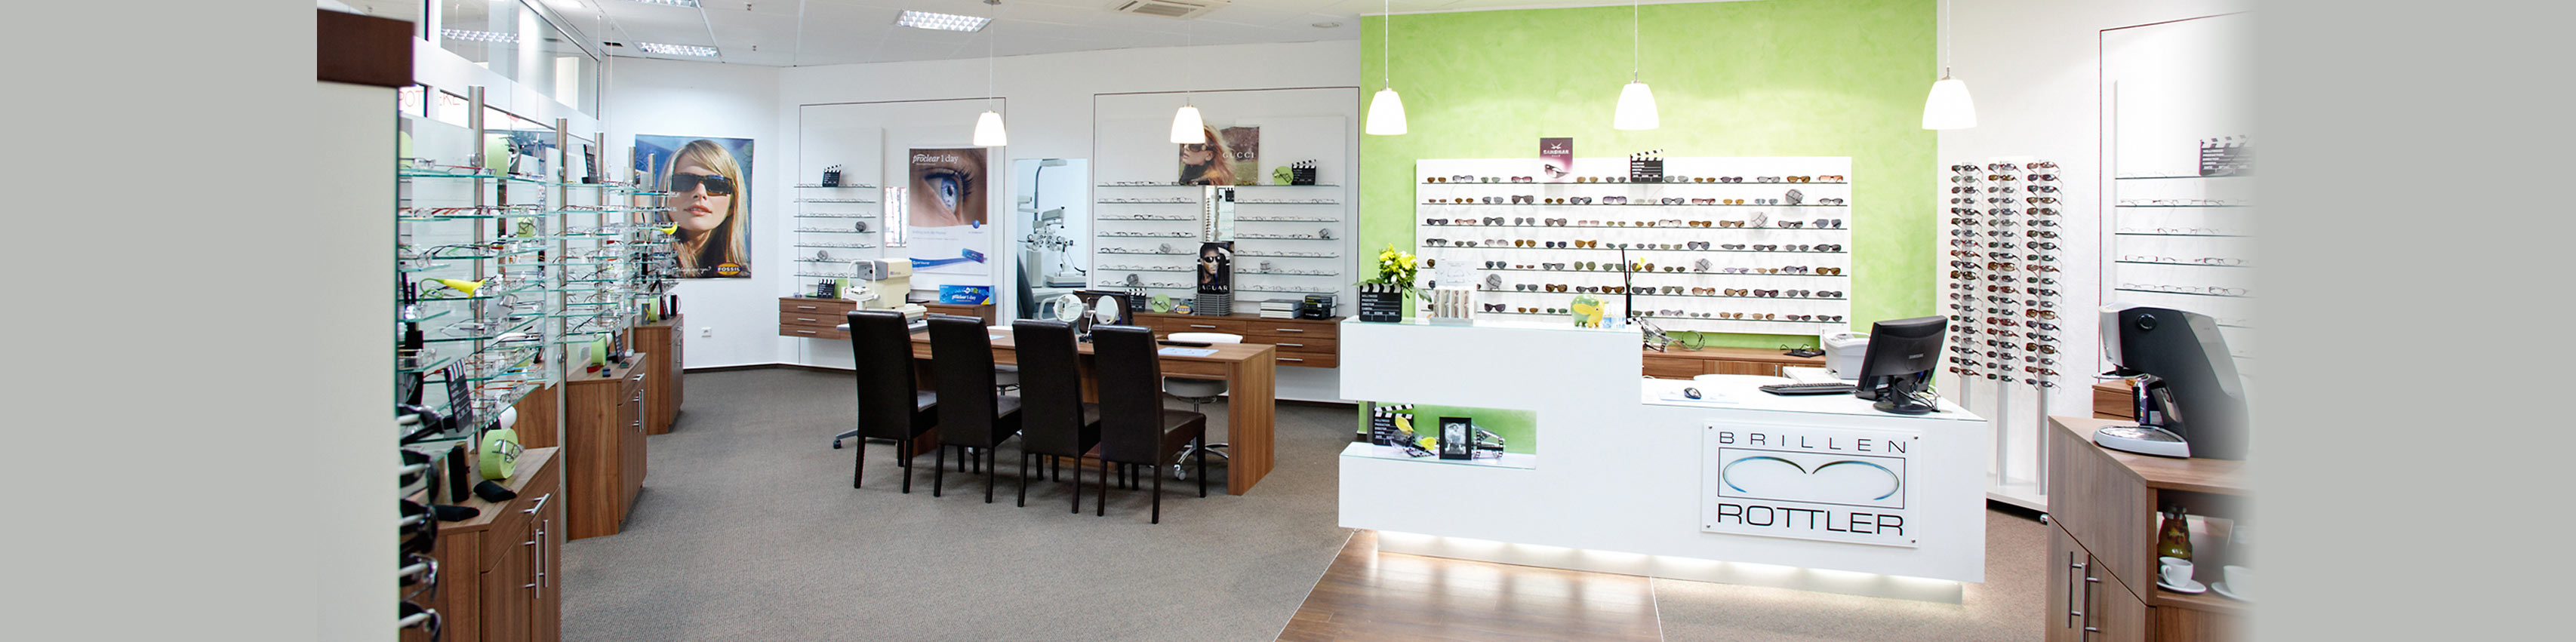 brillen und kontaktlinsen in soest jetzt beraten lassen. Black Bedroom Furniture Sets. Home Design Ideas